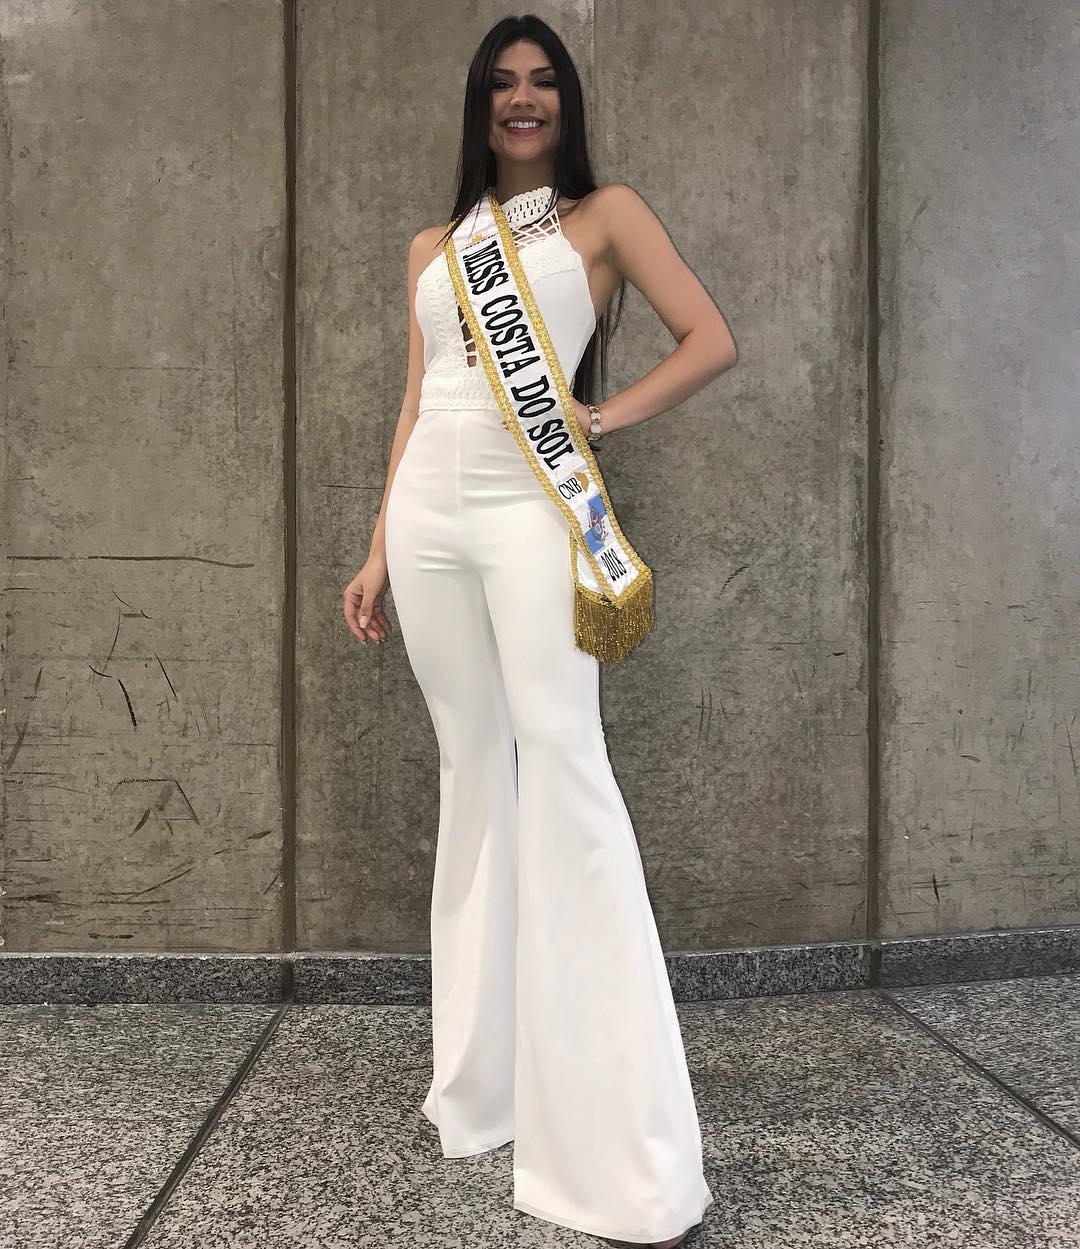 gleycy correia, miss brasil continentes unidos 2018. - Página 3 38081114